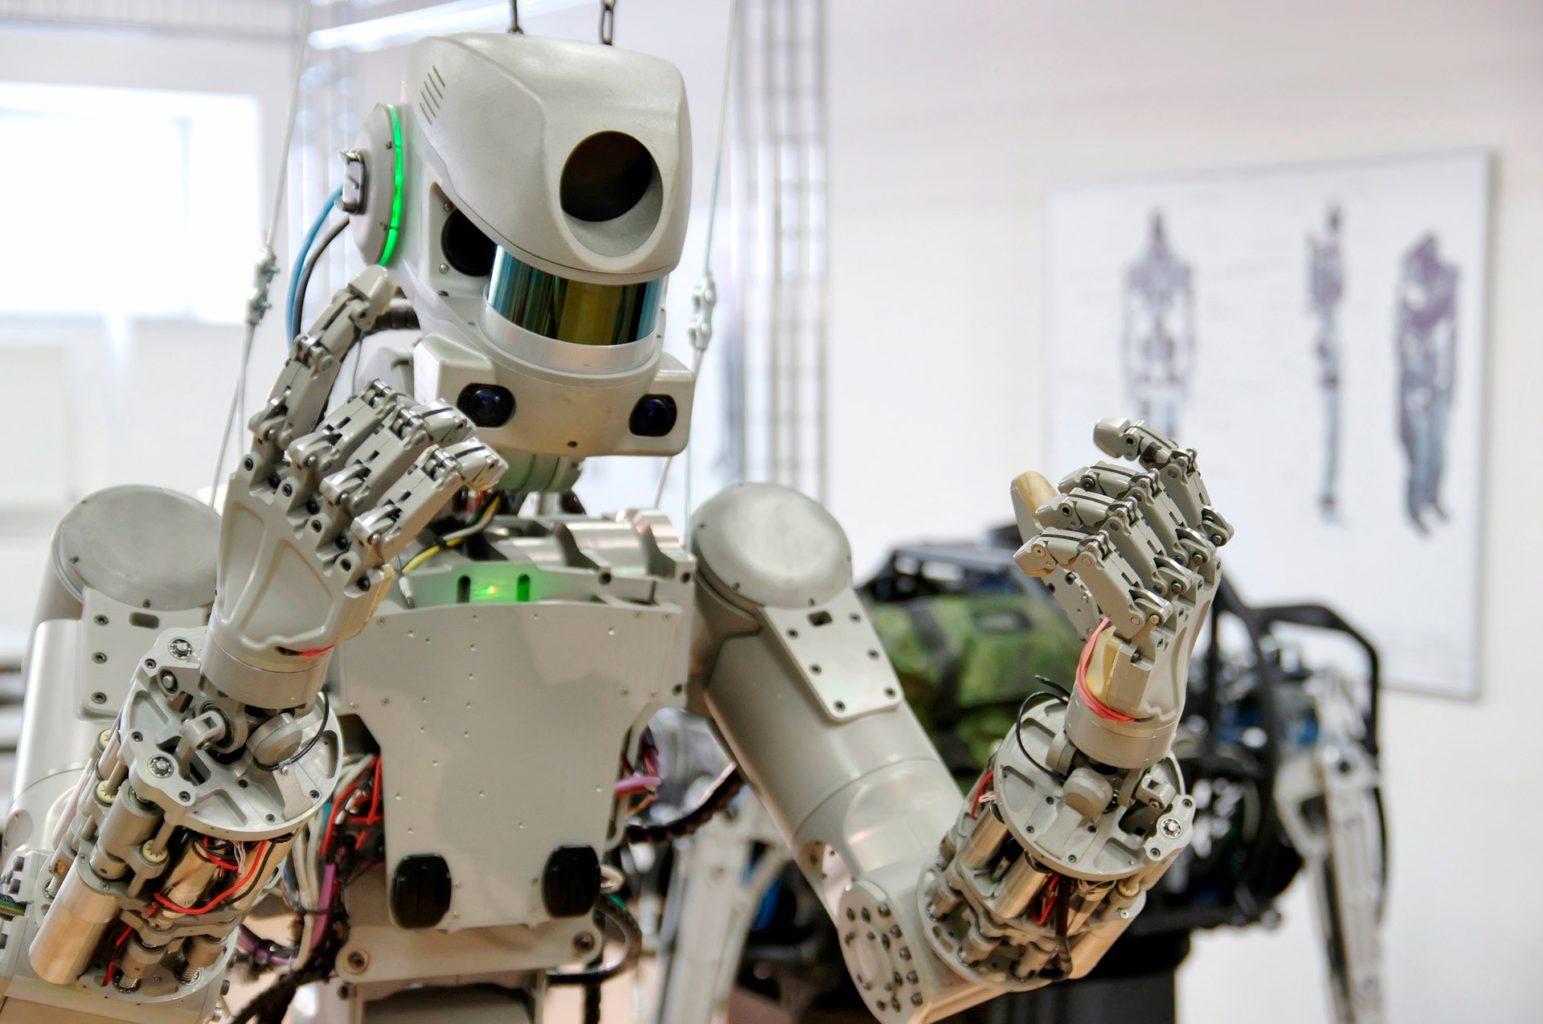 Робот Федор занял кресло пилота на корабле «Союз МС-14»